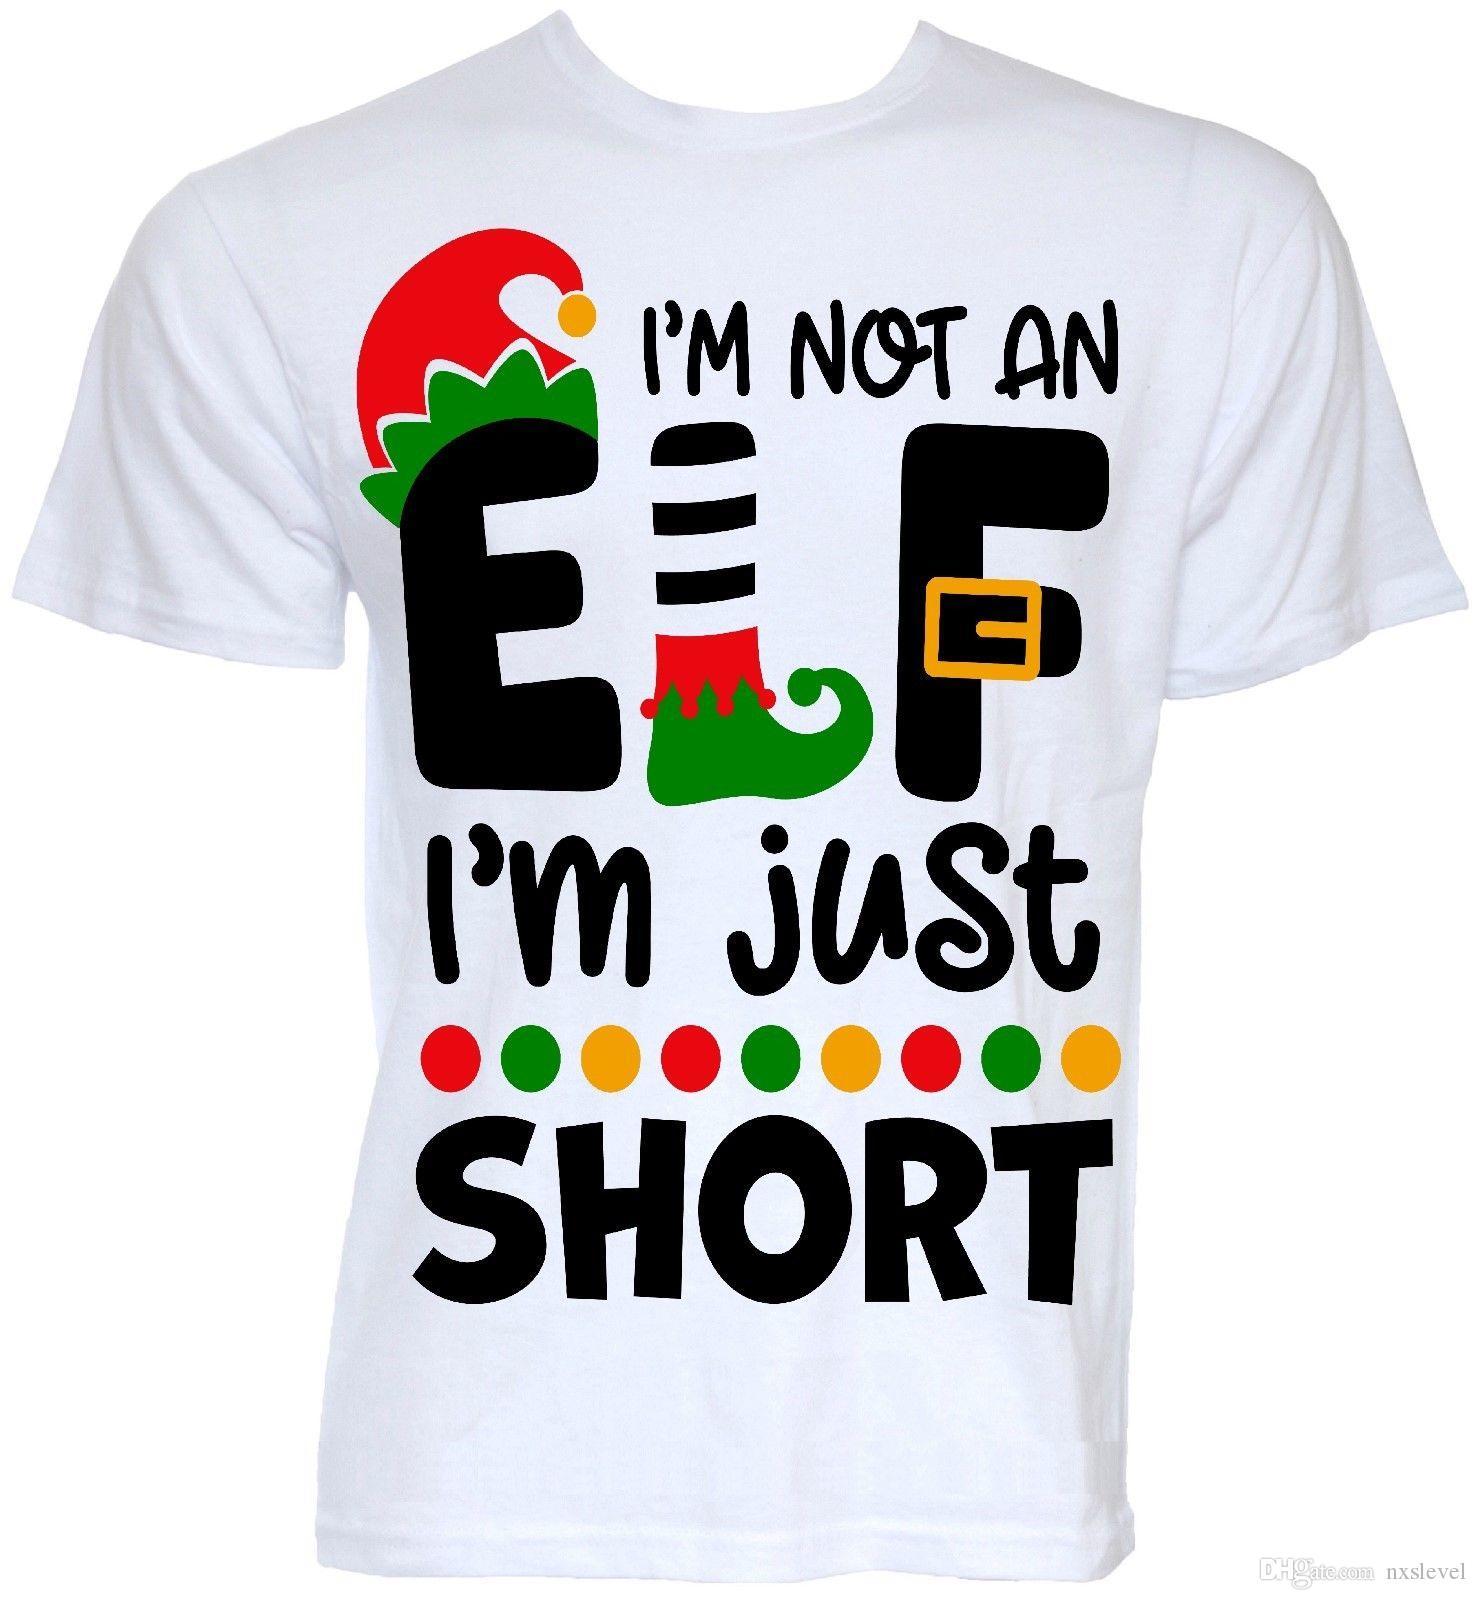 35ff9d66 Funny Christmas T Shirts Mens Novelty Rude Secret Santa Elf Slogan Joke  Gifts Awesome T Shirt Design Shirt And Tshirt From Nxslevel, $10.21   DHgate.Com